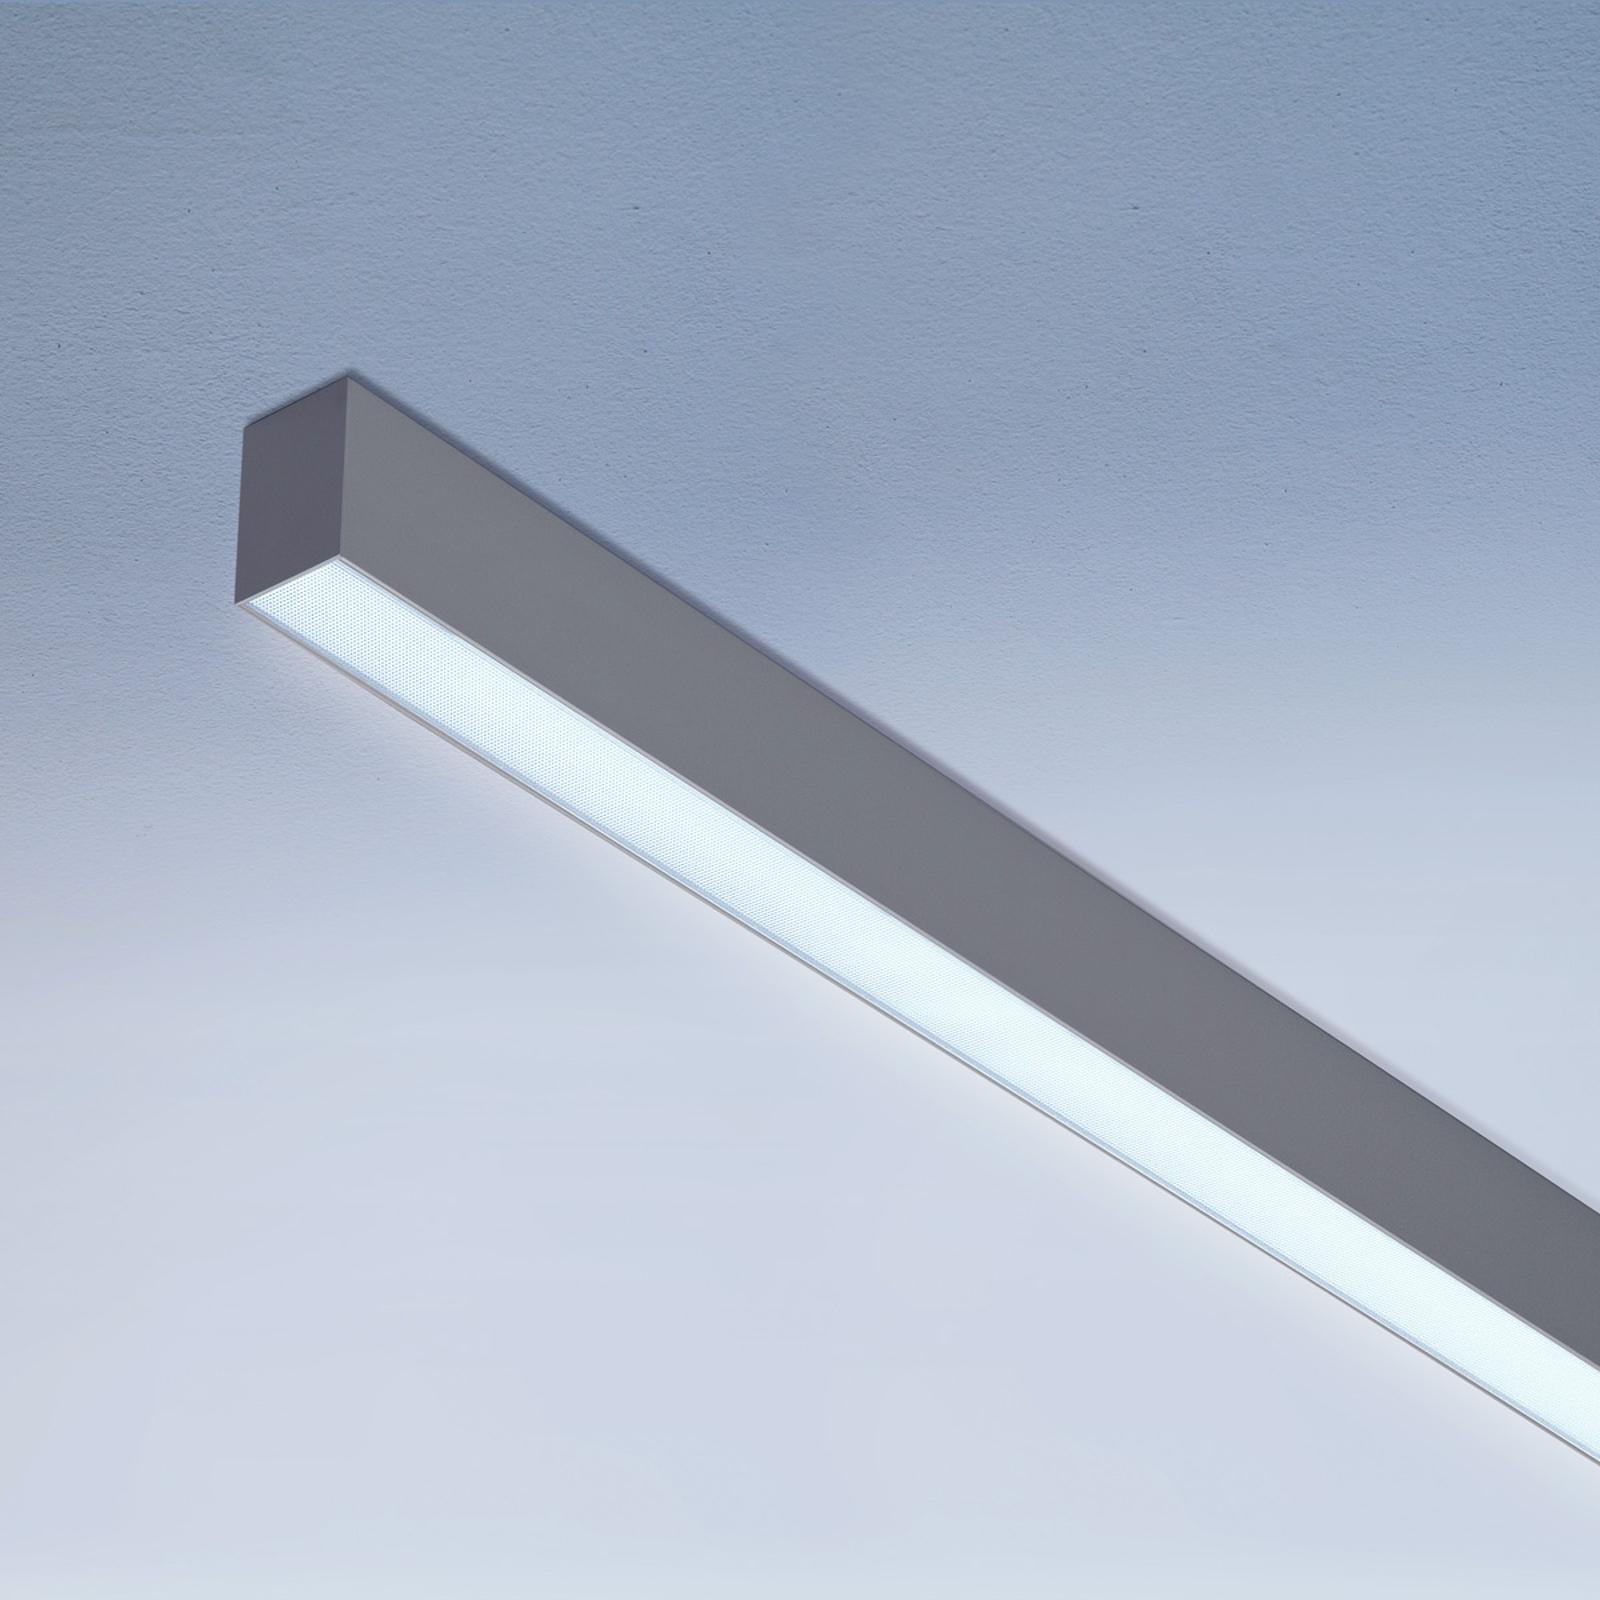 Keskiteho - LED-seinävalaisin Matric-A3 118,2 cm